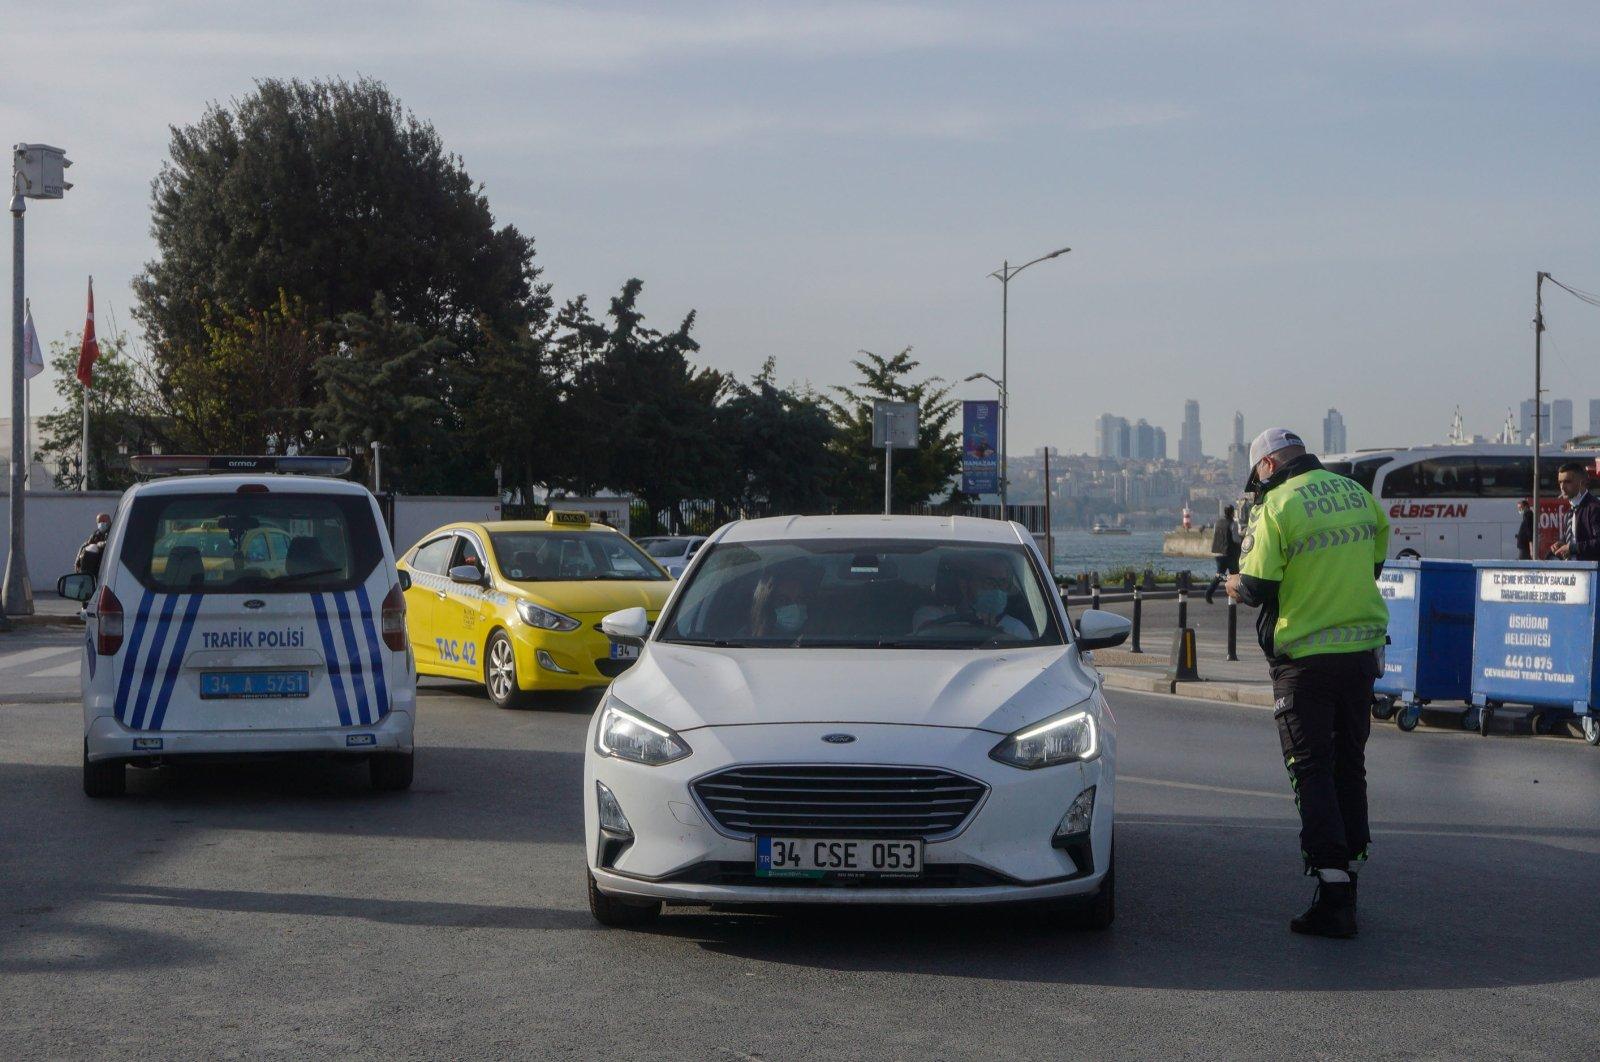 A traffic police checks a car in Üsküdar, Istanbul, Turkey, April 29, 2021.